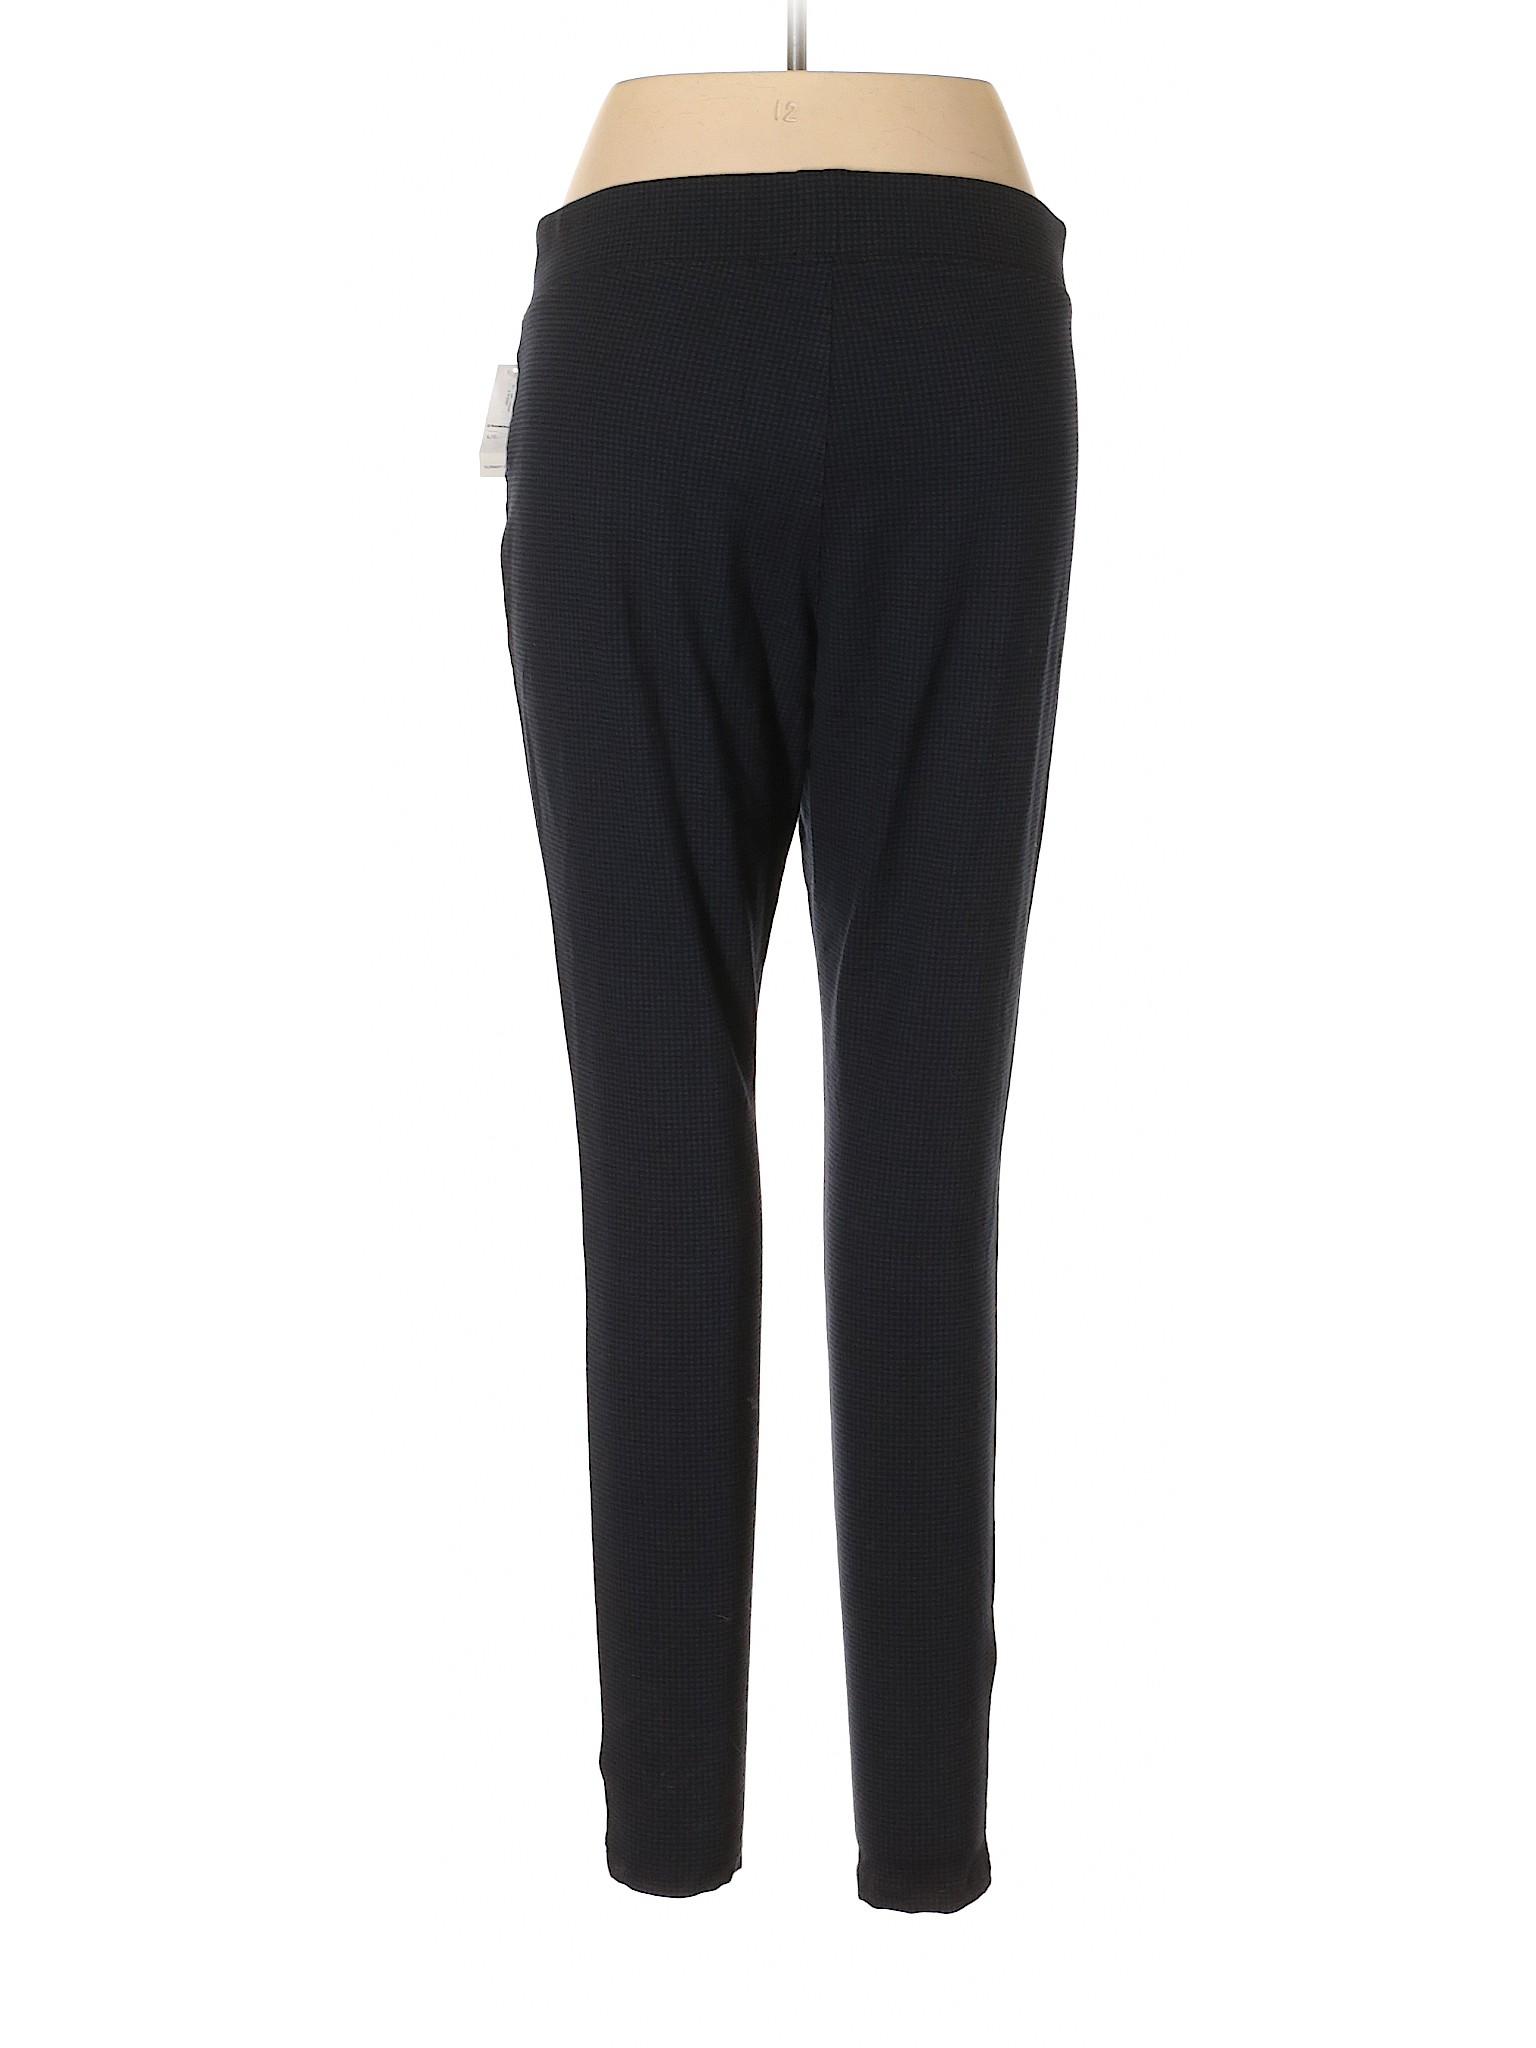 leisure Navy Old Pants Casual Boutique wqBxdE7w